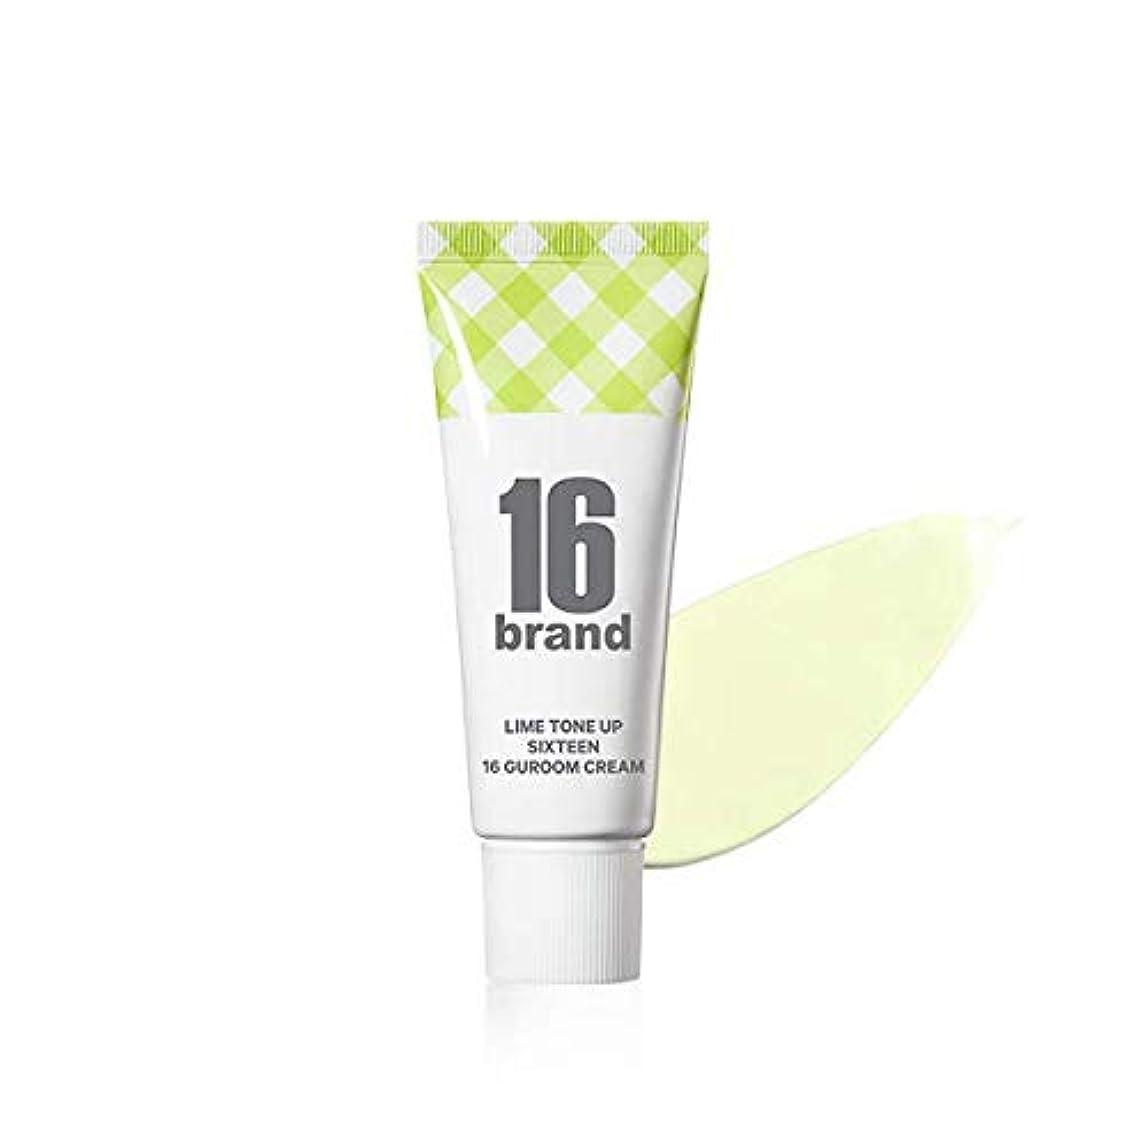 16 Brand Sixteen Guroom Lime Tone Up Cream * 30ml (tube type) / 16ブランド シックスティーン クルム ライムクリーム SPF30 PA++ [並行輸入品]